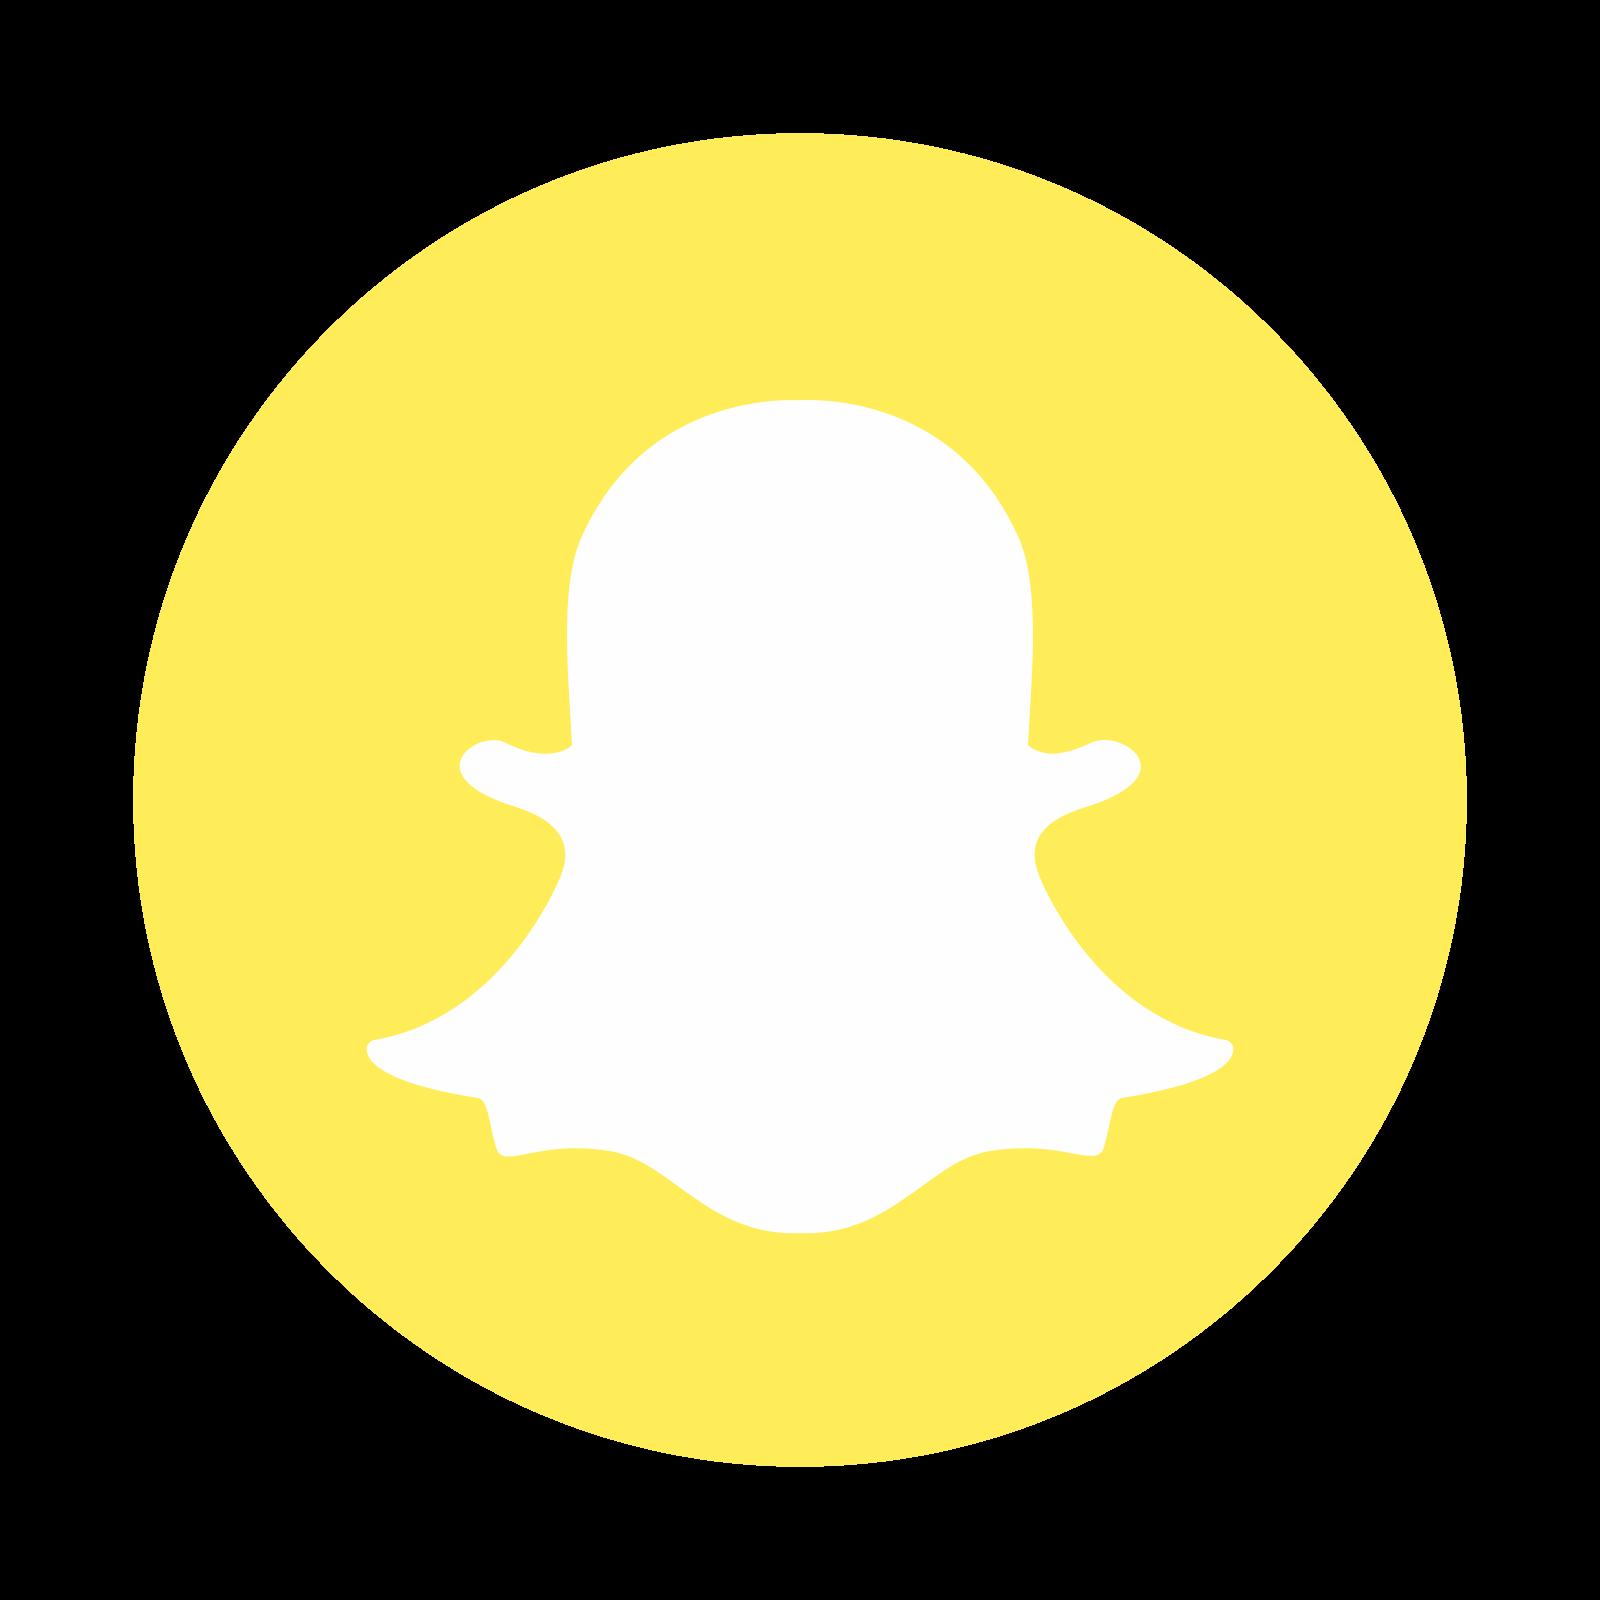 Snapchat Logo PNG, Snapchat Logo Transparent Background ...